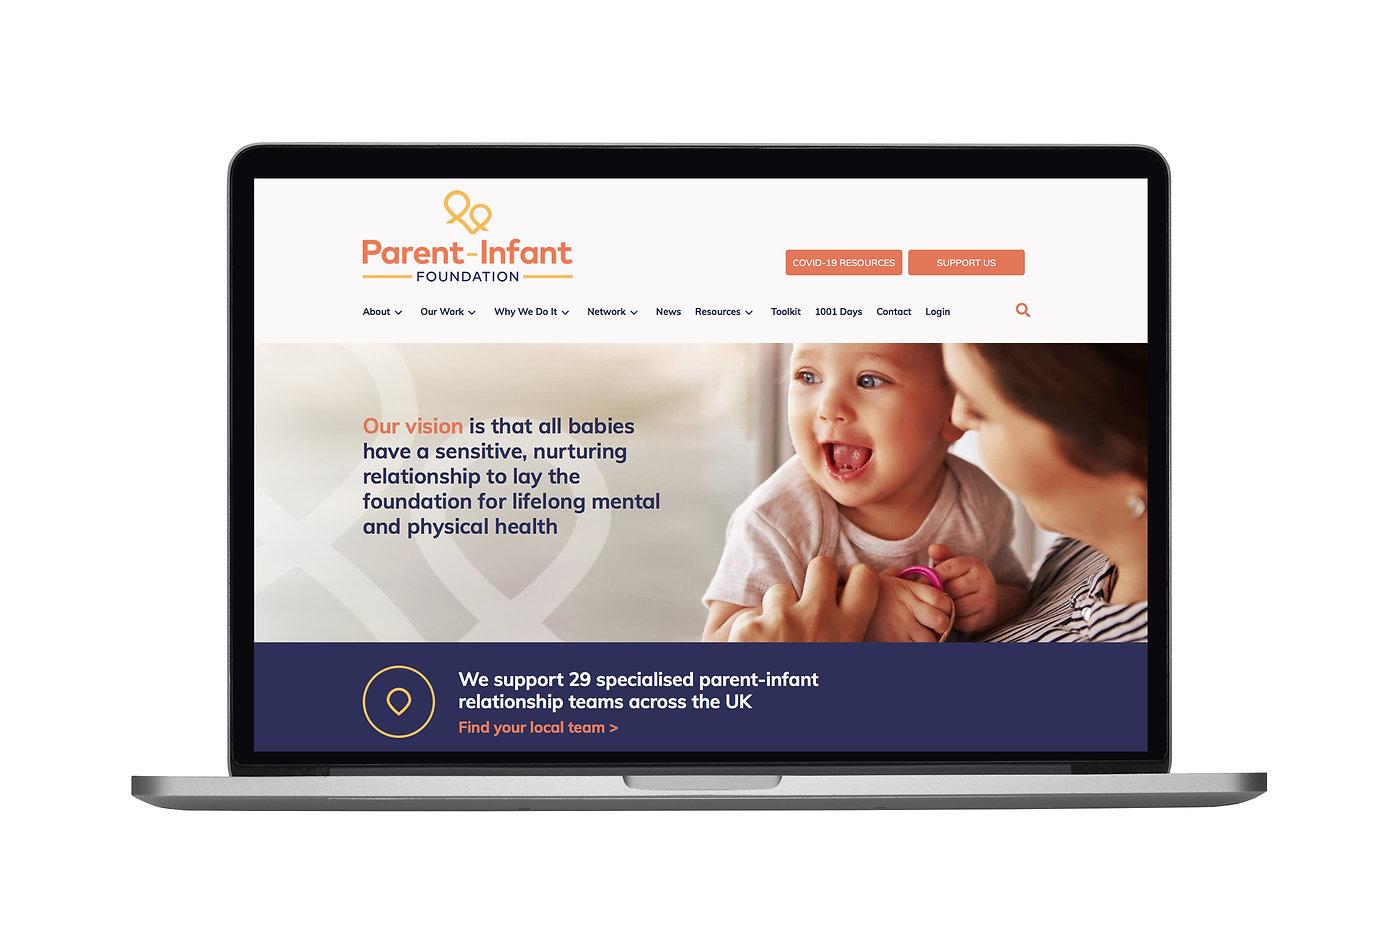 Parent-Infant Foundation Website